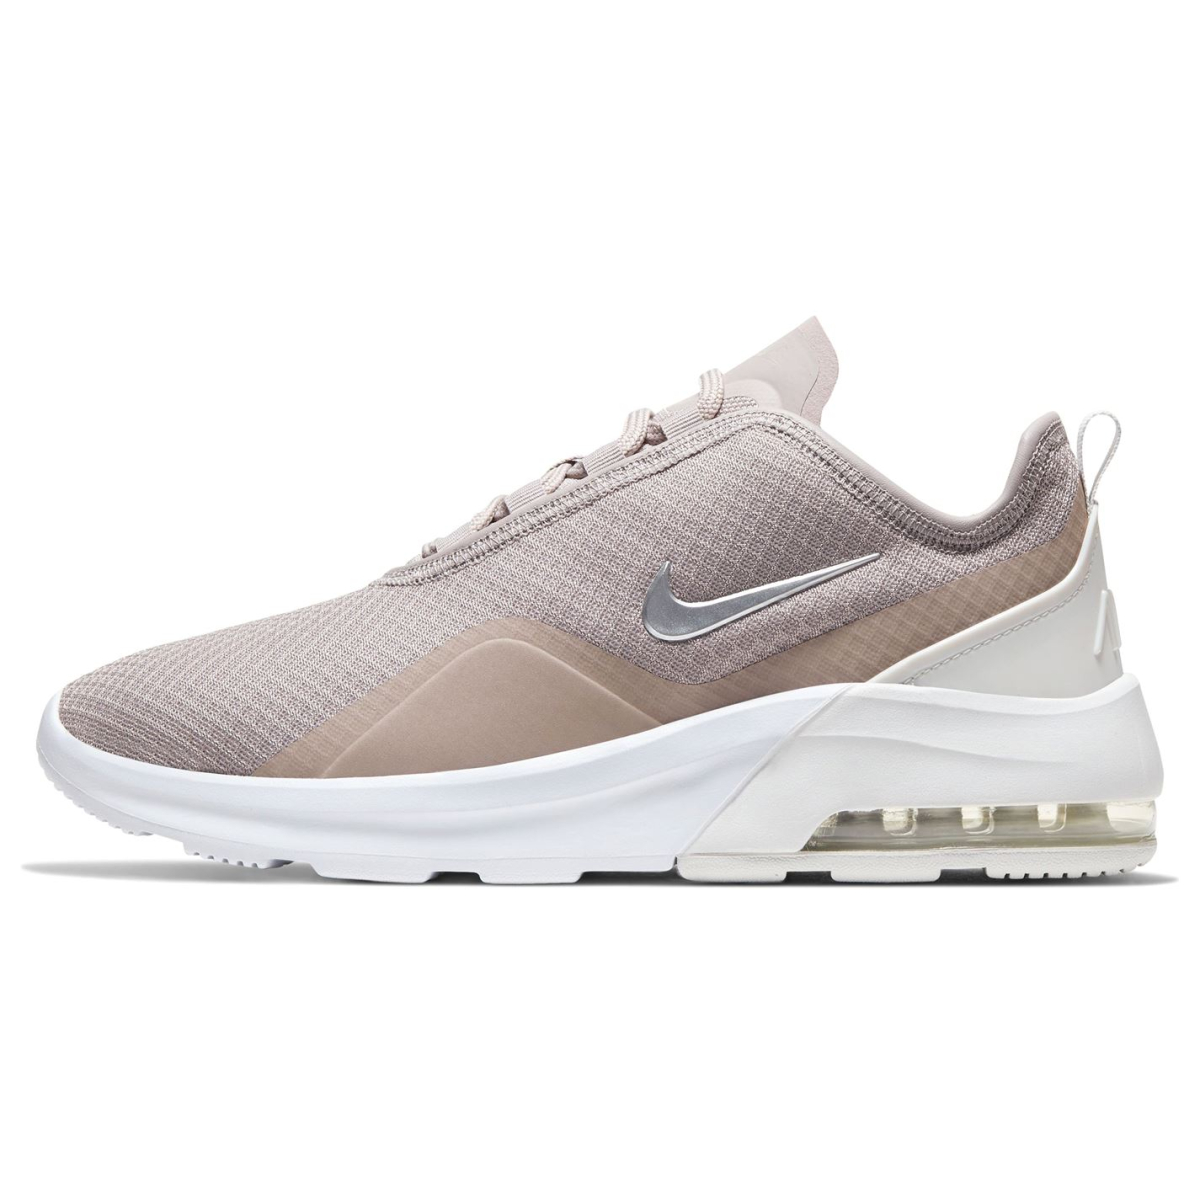 Nike Air Max Motion 2 Turnschuhe Damen Sneaker Sportschuhe Laufschuhe 4024